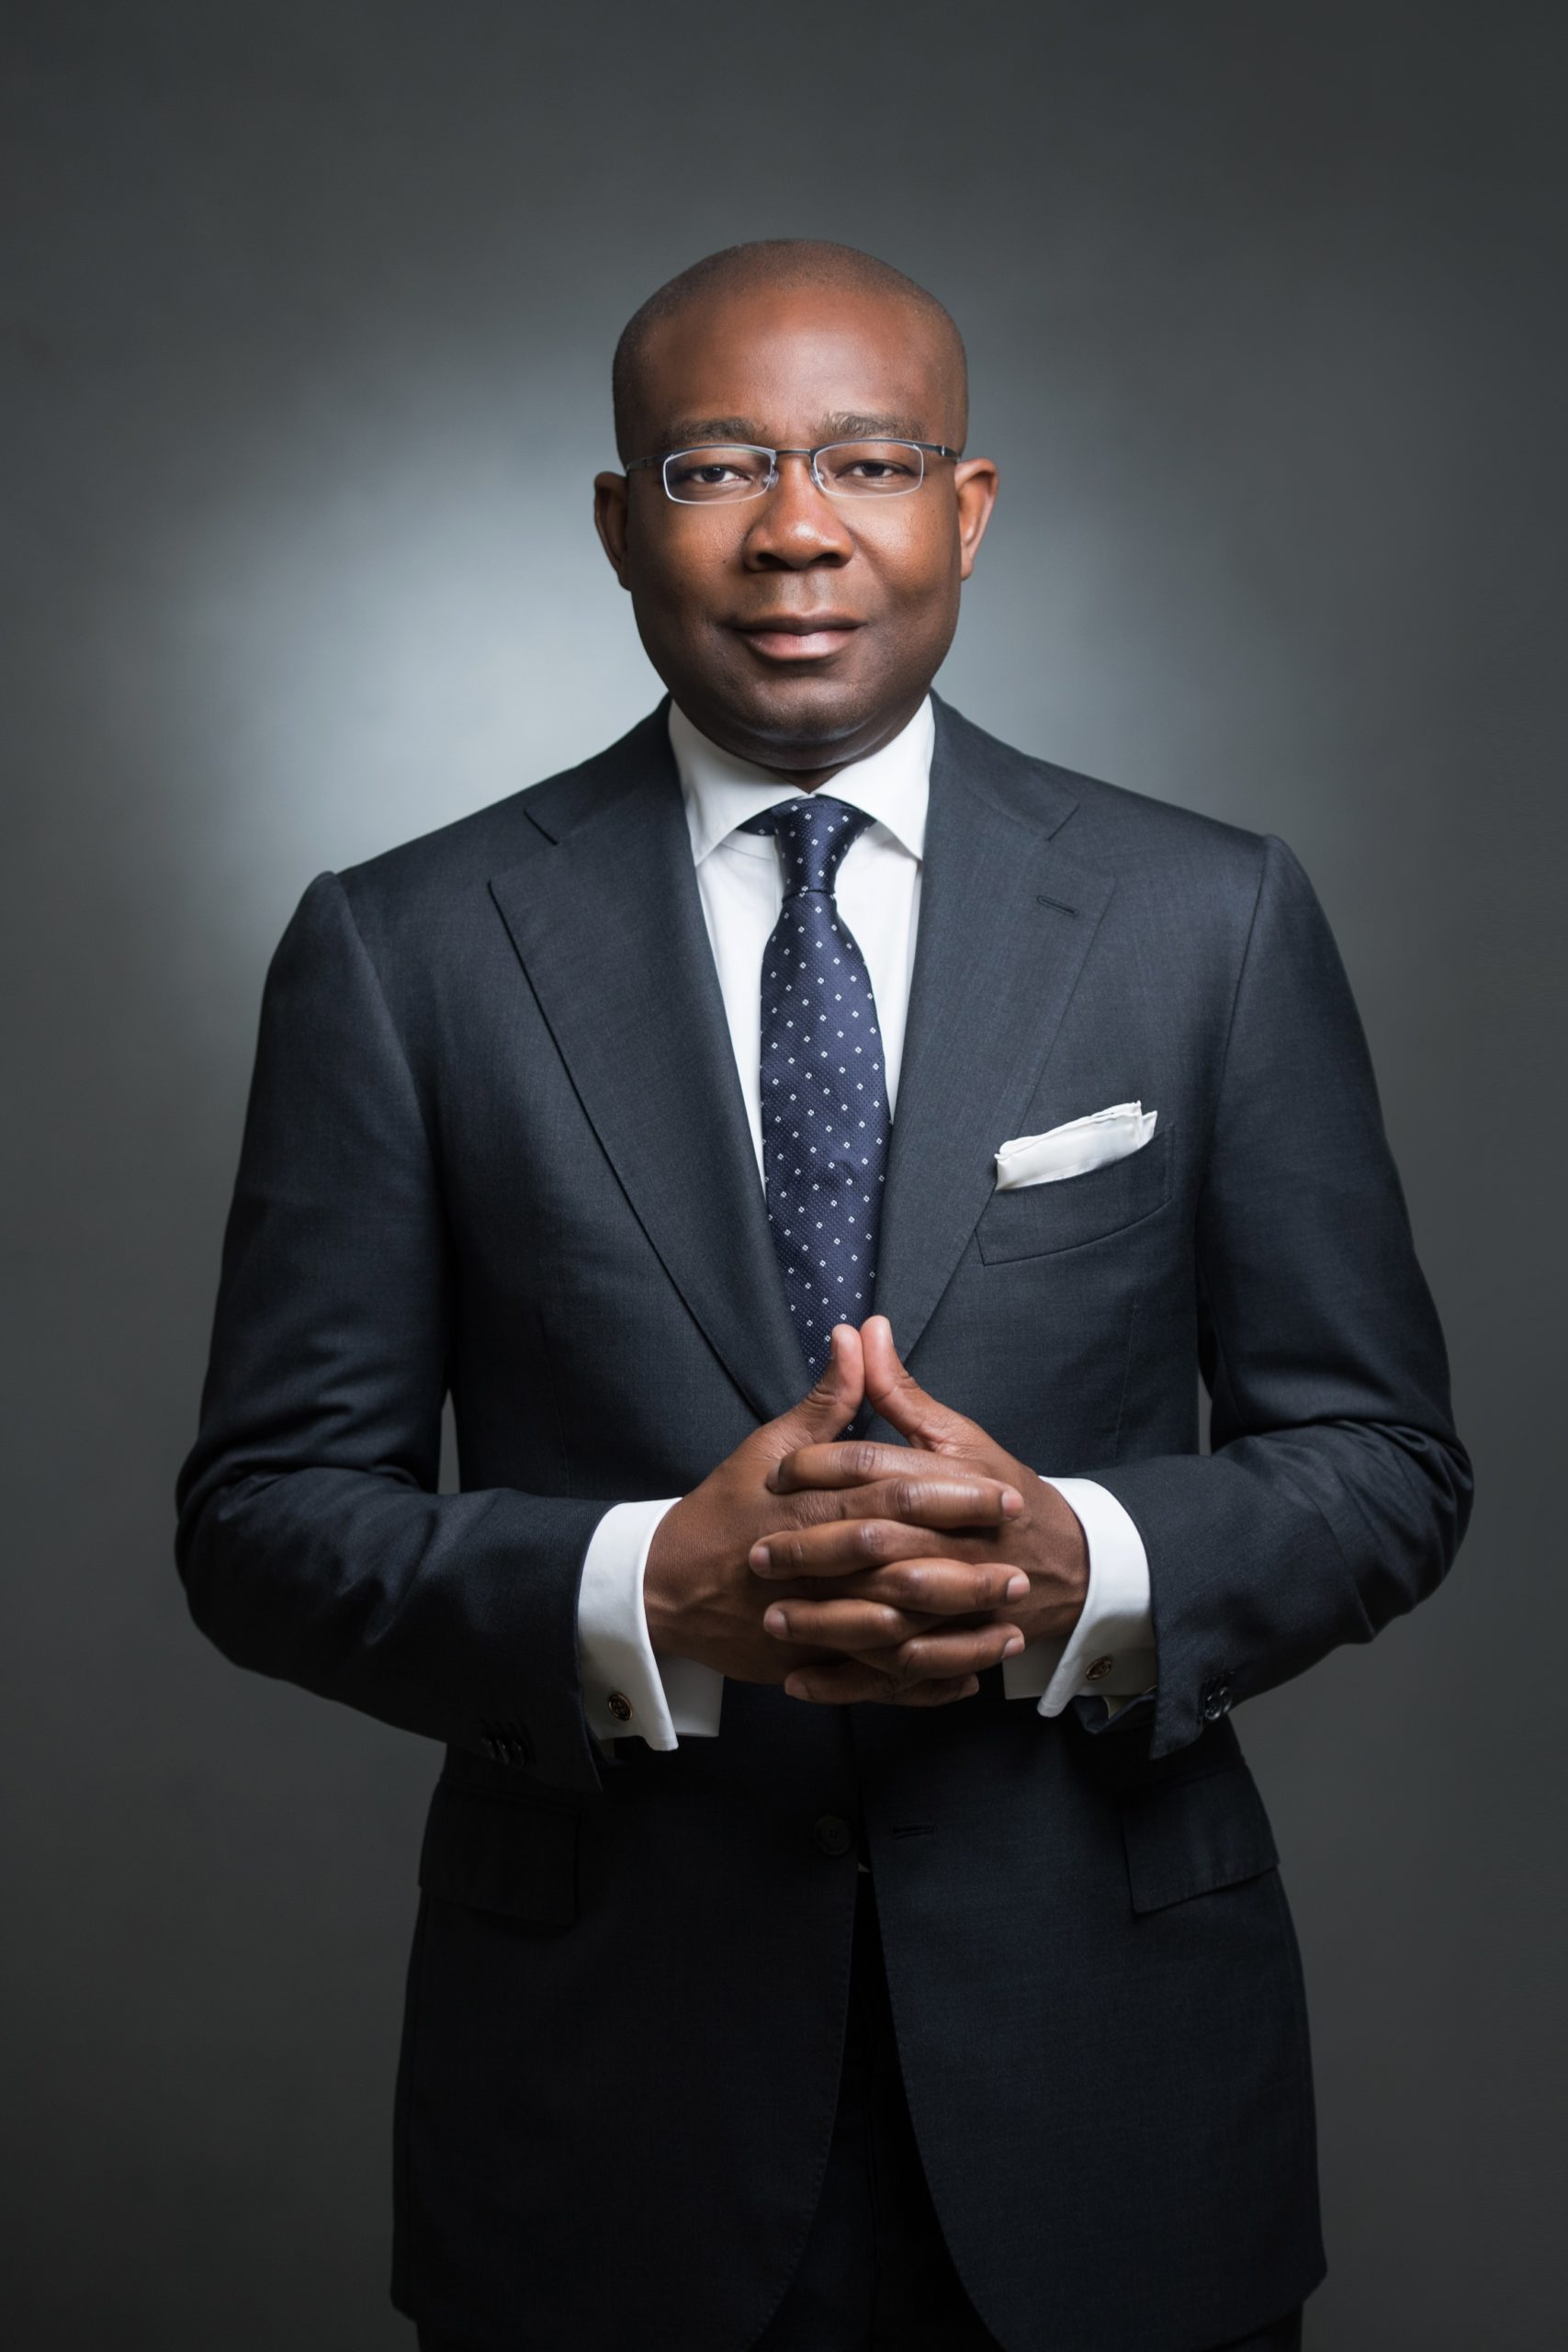 NSE Celebrates Aigboje Aig-Imoukhuede Brandnewsday